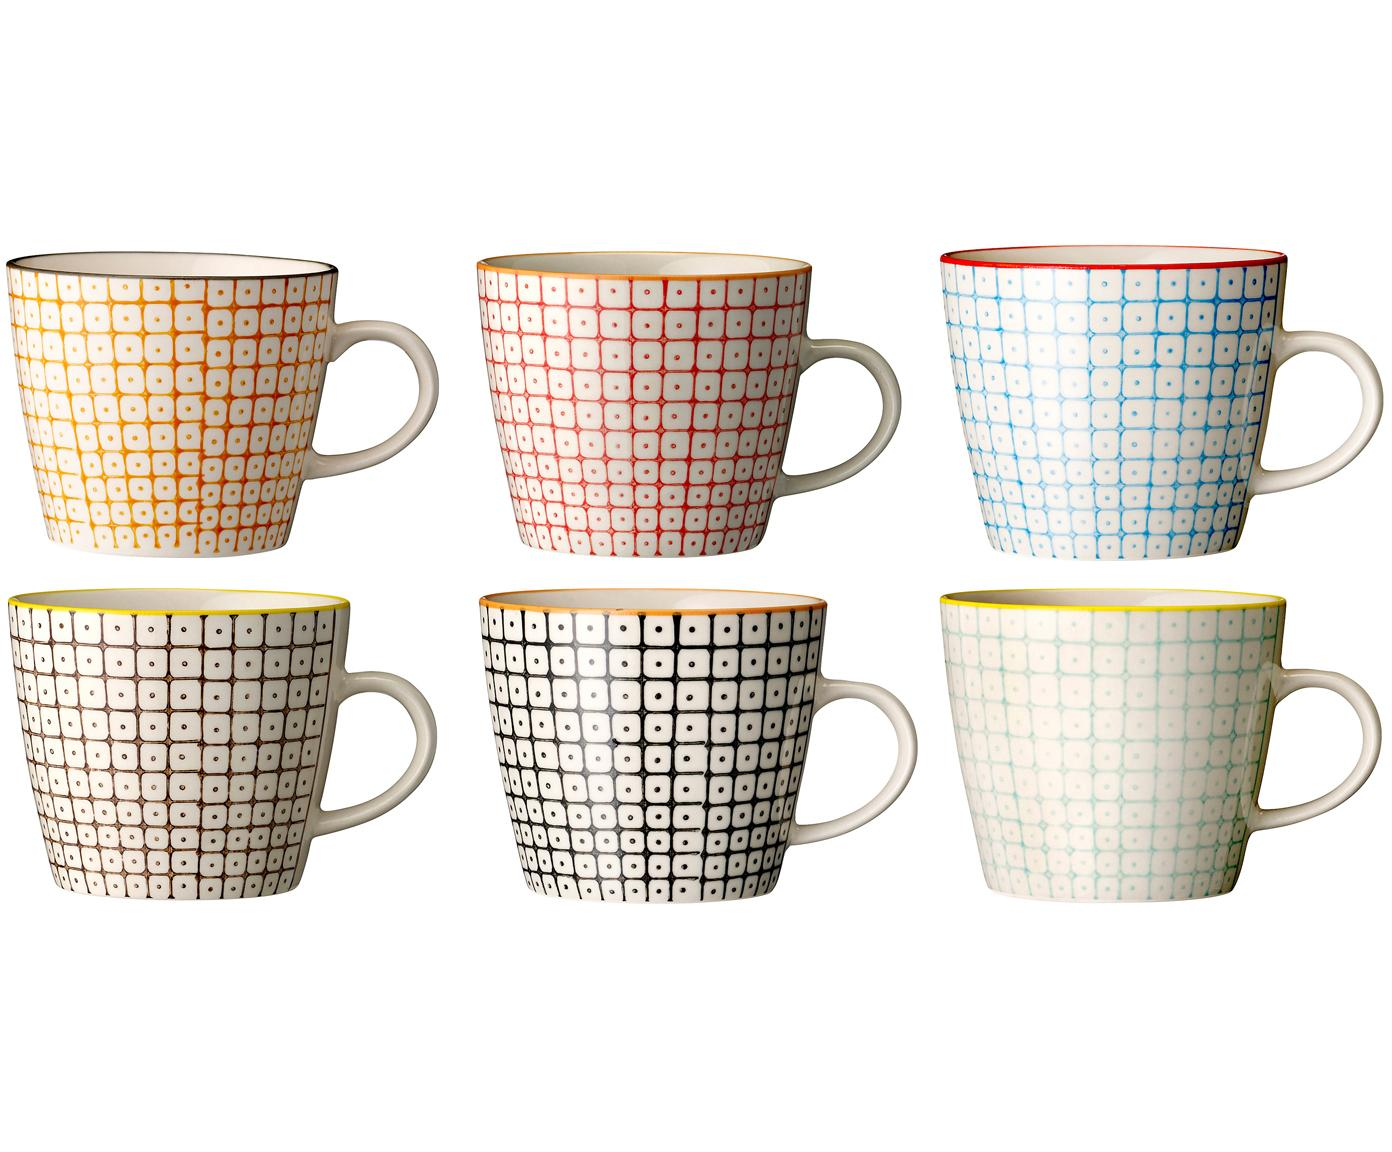 Tassen-Set Carla, 6-tlg., Steingut, Mehrfarbig, Ø 10 x H 8 cm